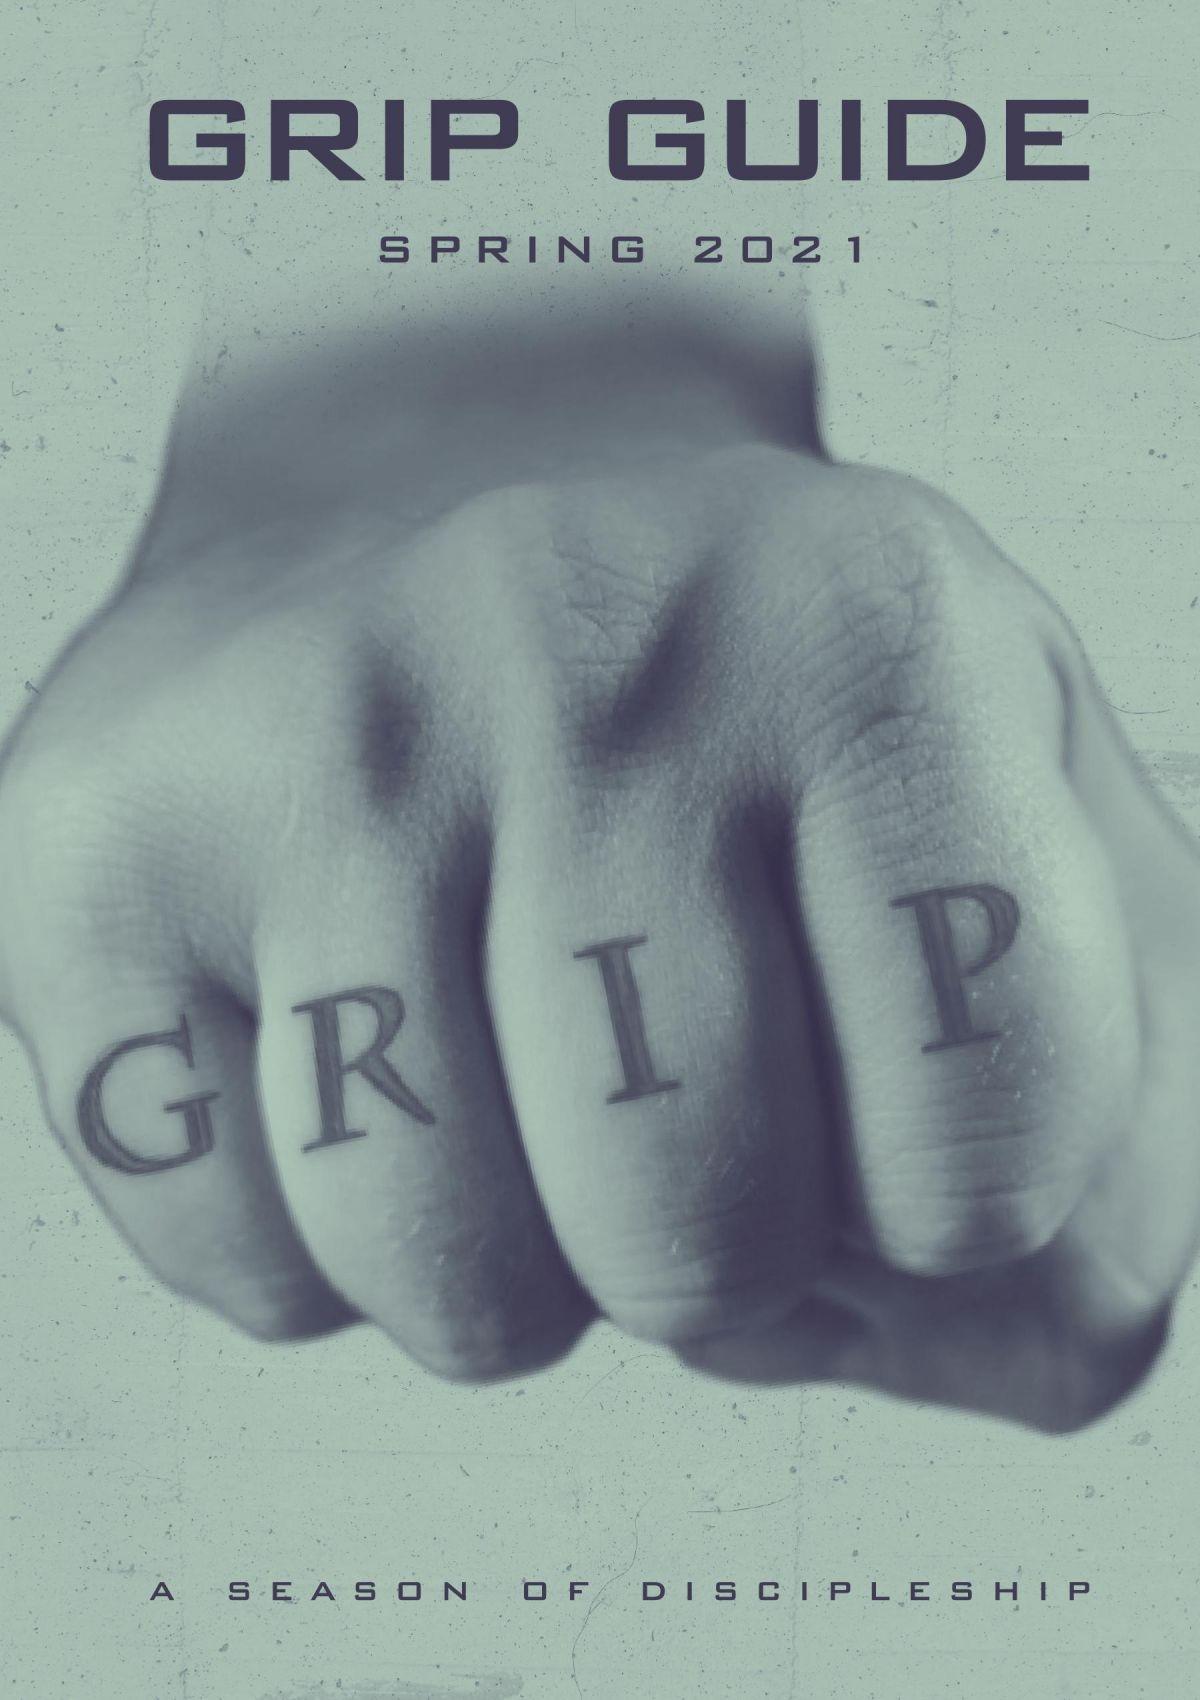 GRIP Guide Spring 2021